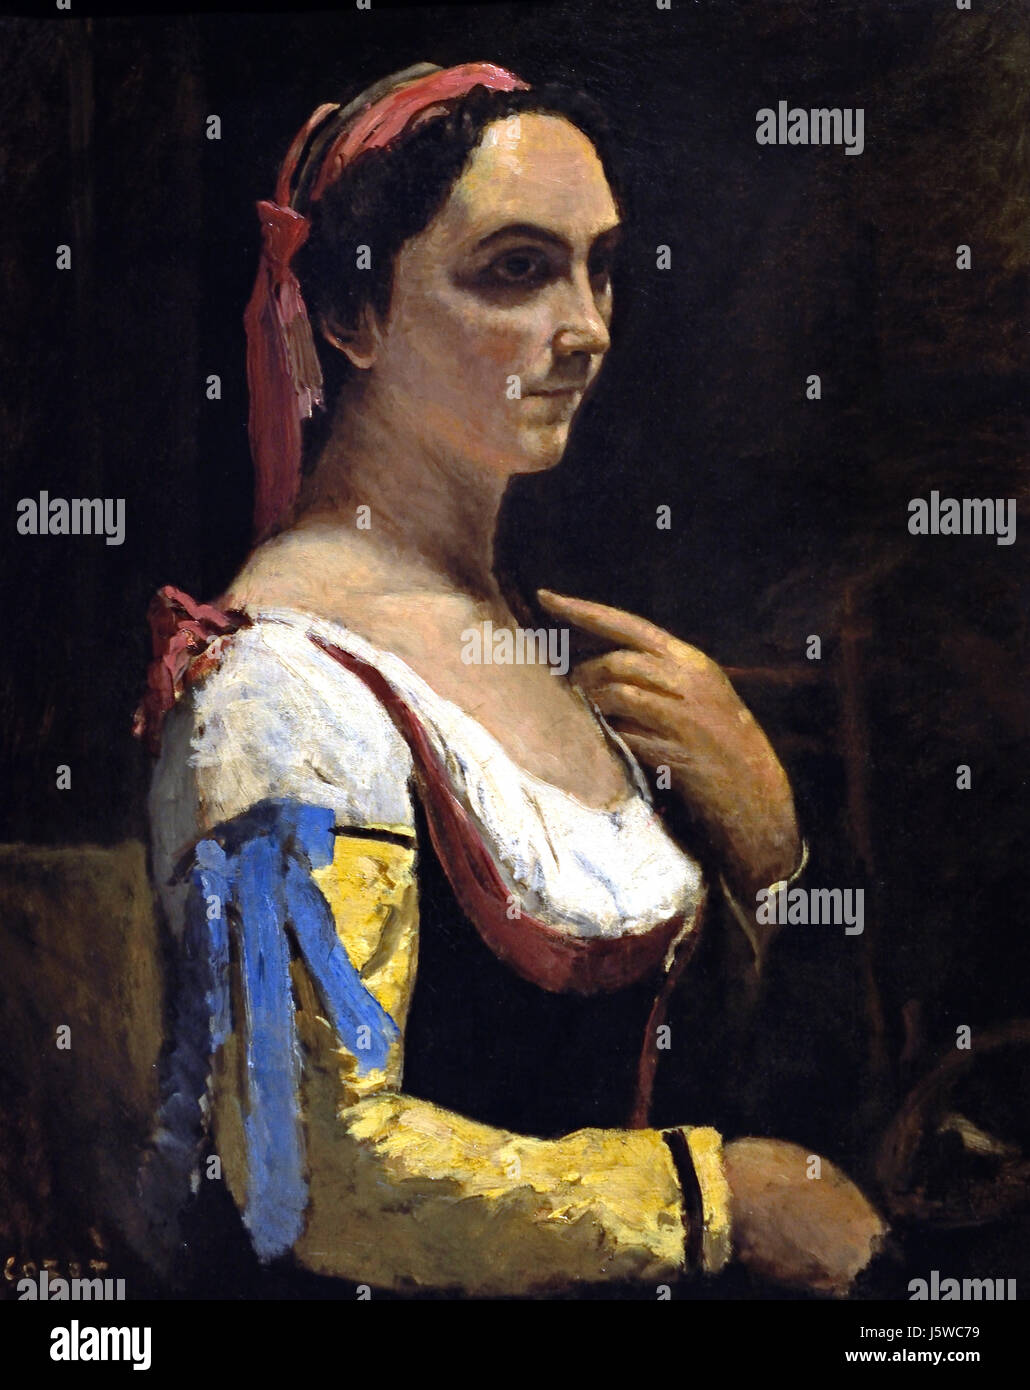 Mujer vestida de azul corot